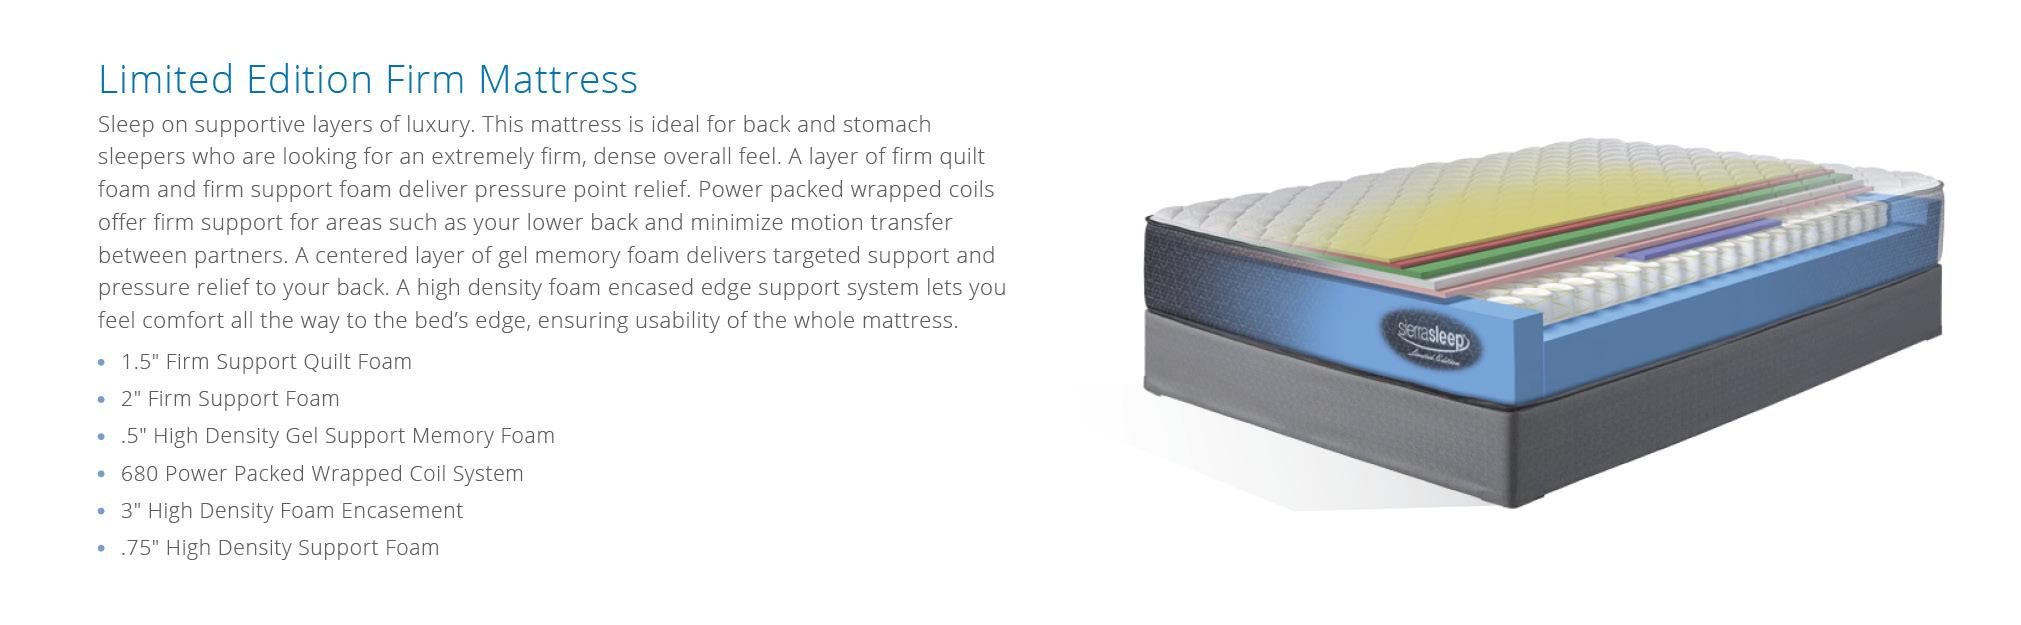 Amazon Com Ashley Furniture Signature Design Sierra Sleep Limited Edition Firm Mattress